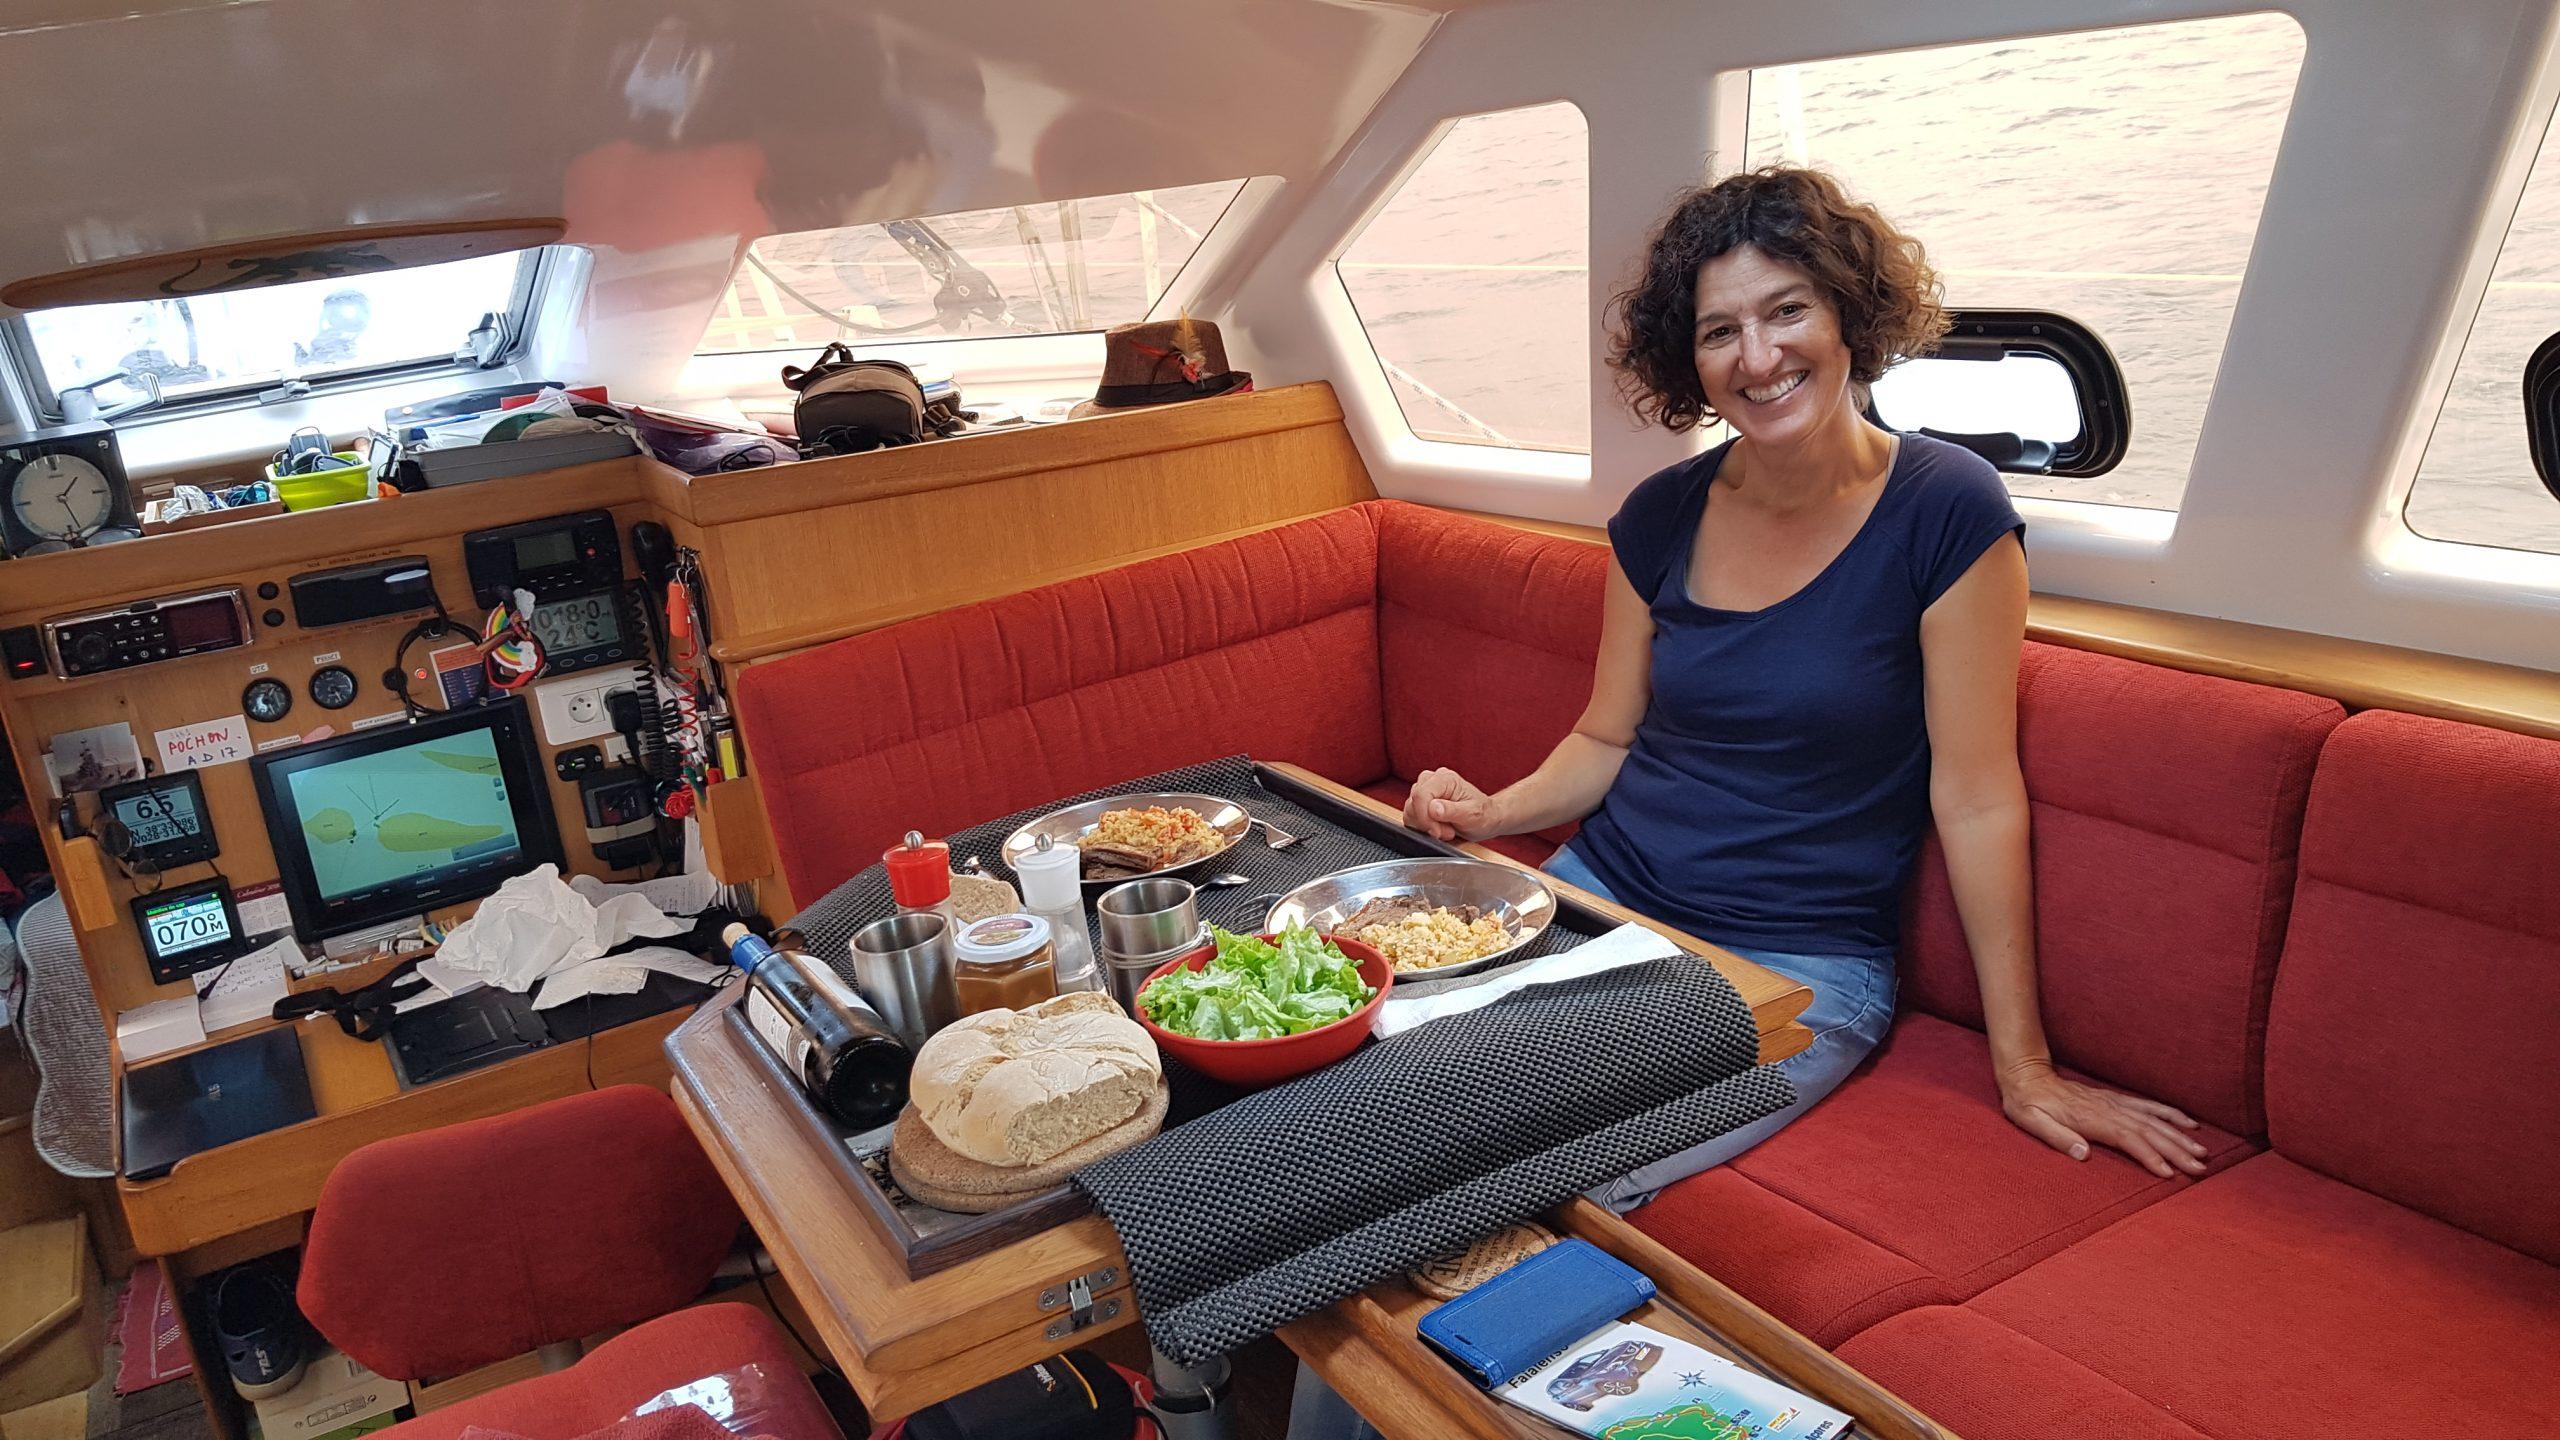 Témoignage Élisabeth – Transatlantique retour via les Açores – Fev/mai 2021